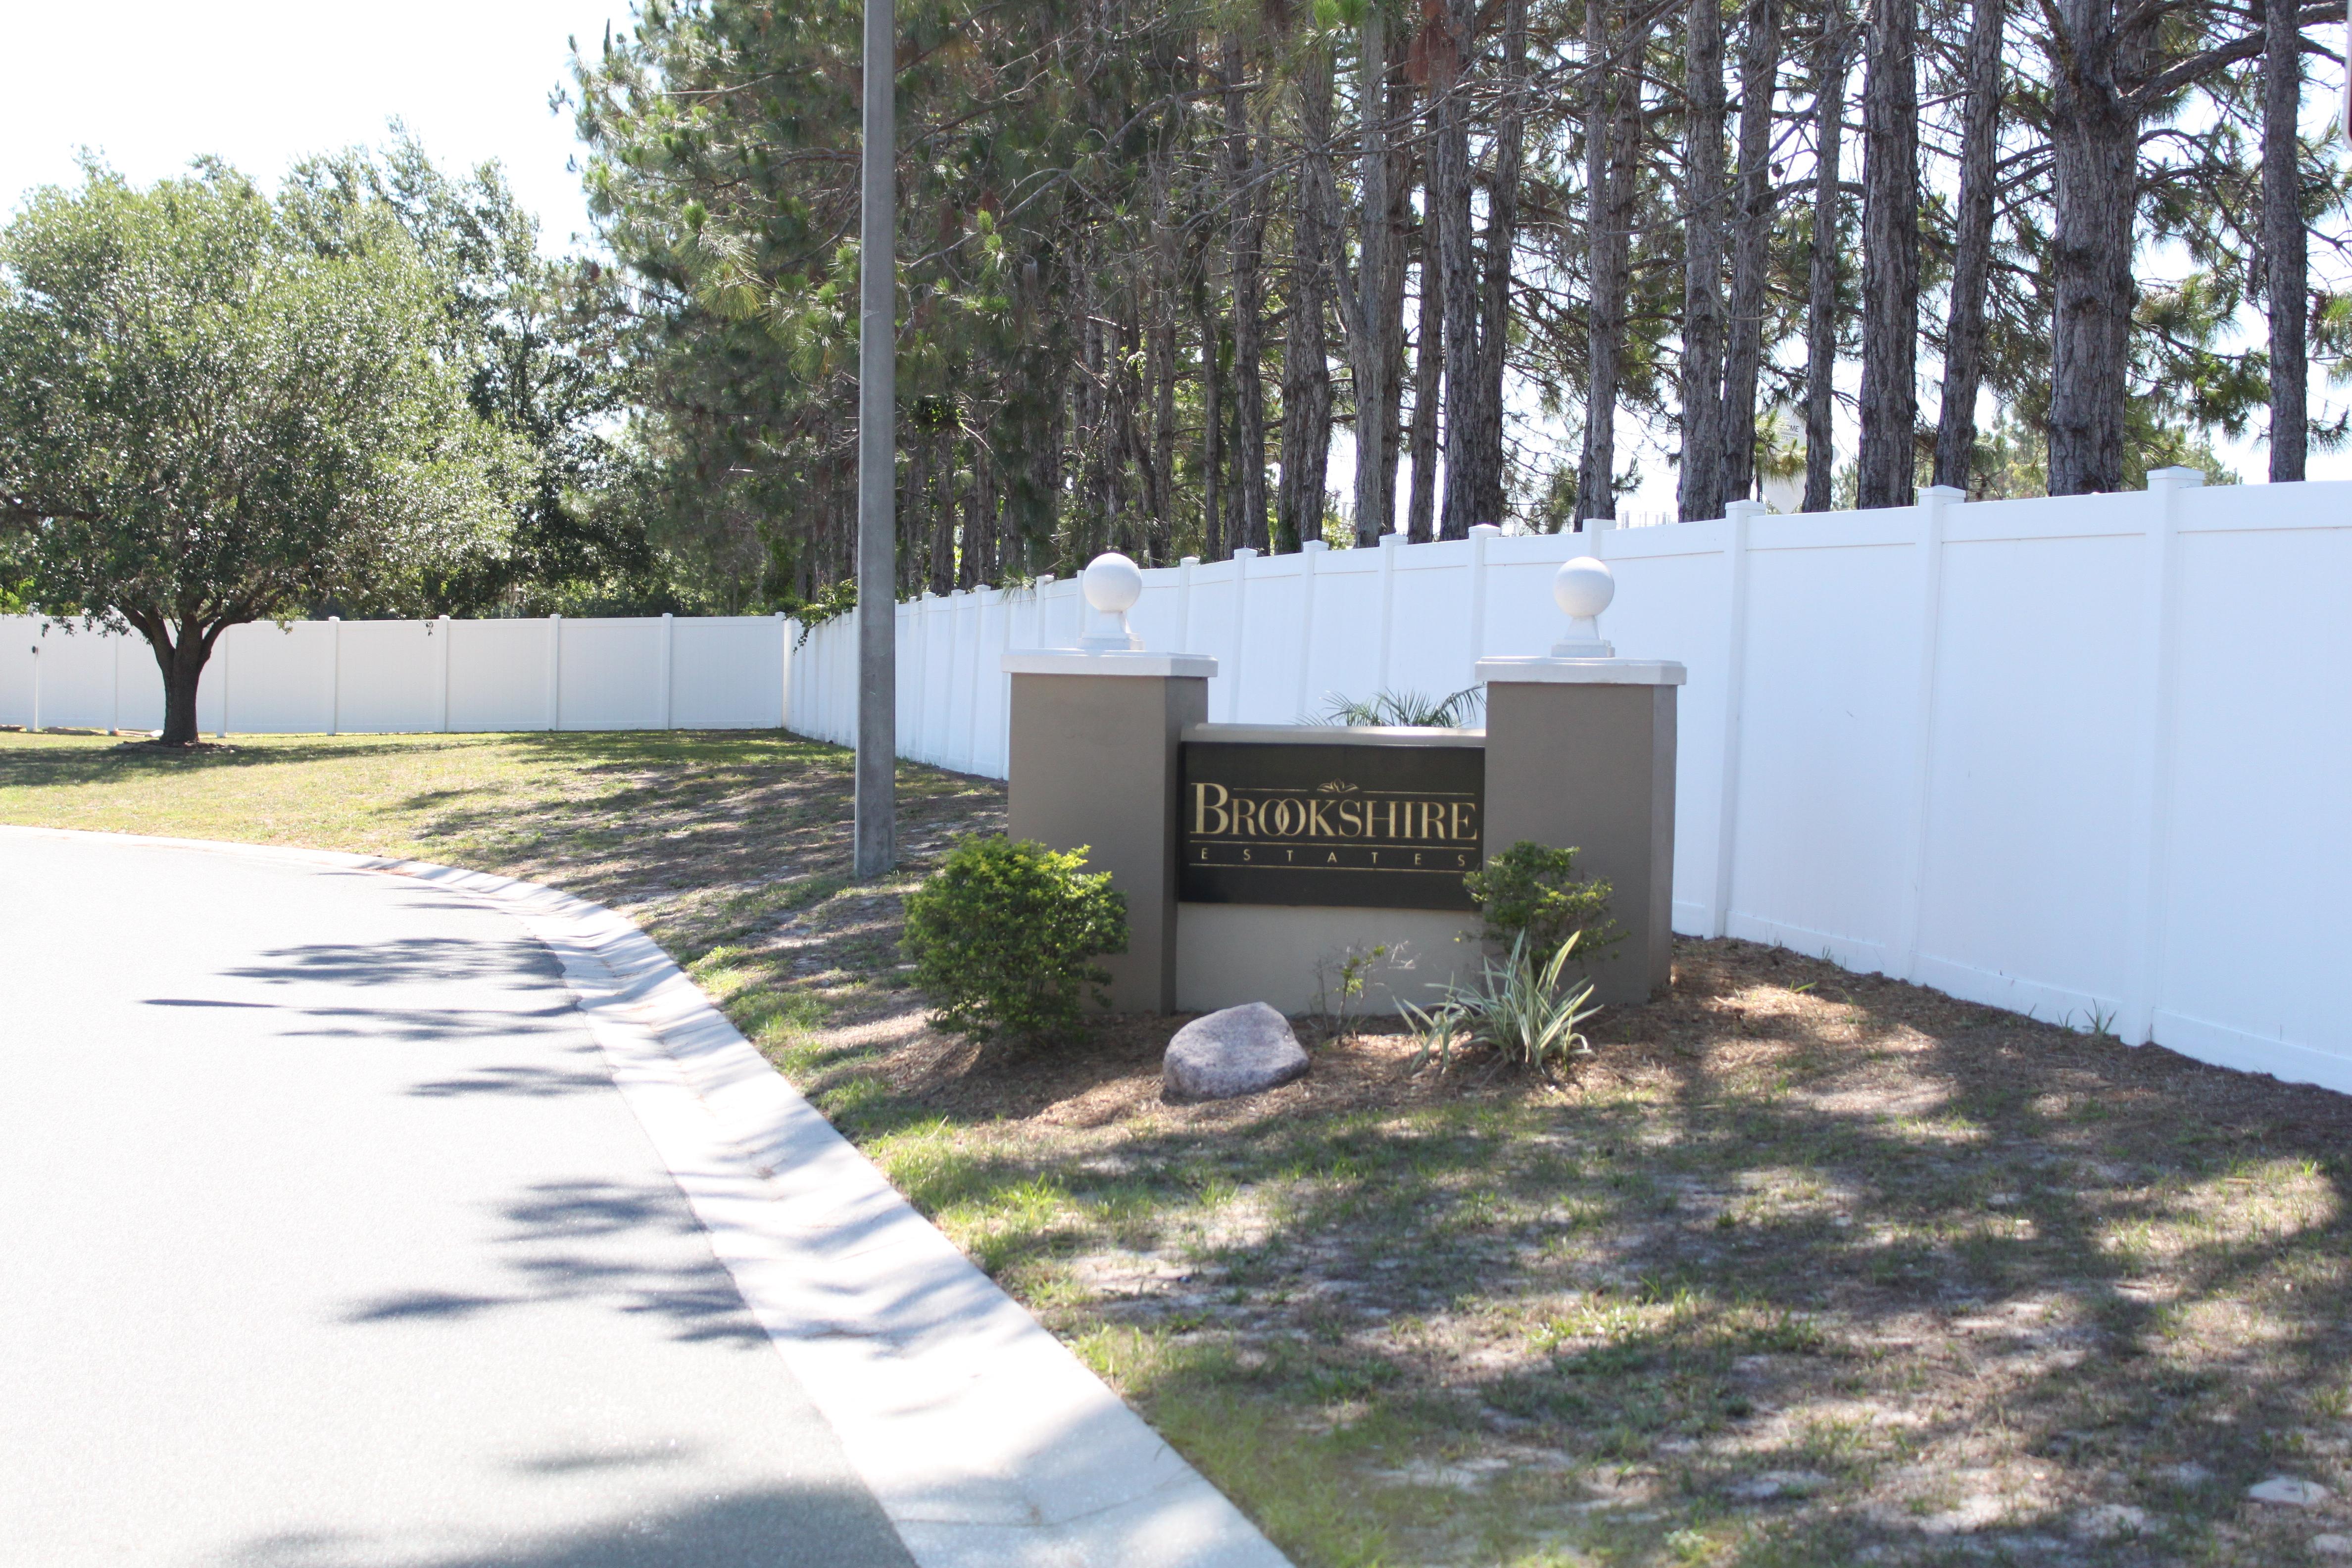 Eastbrook community subdivision, Brookshire Estates